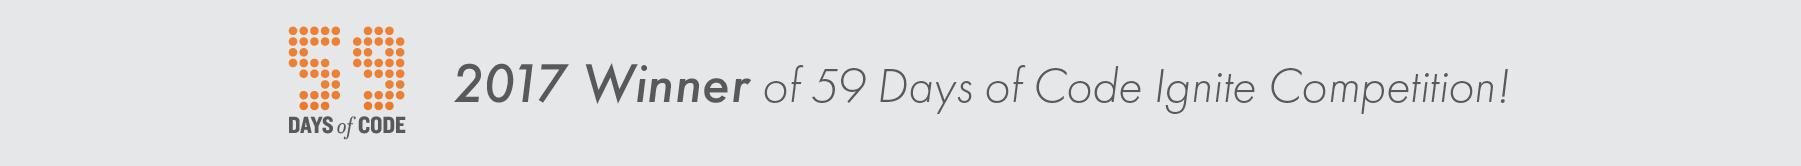 59 Days of Code